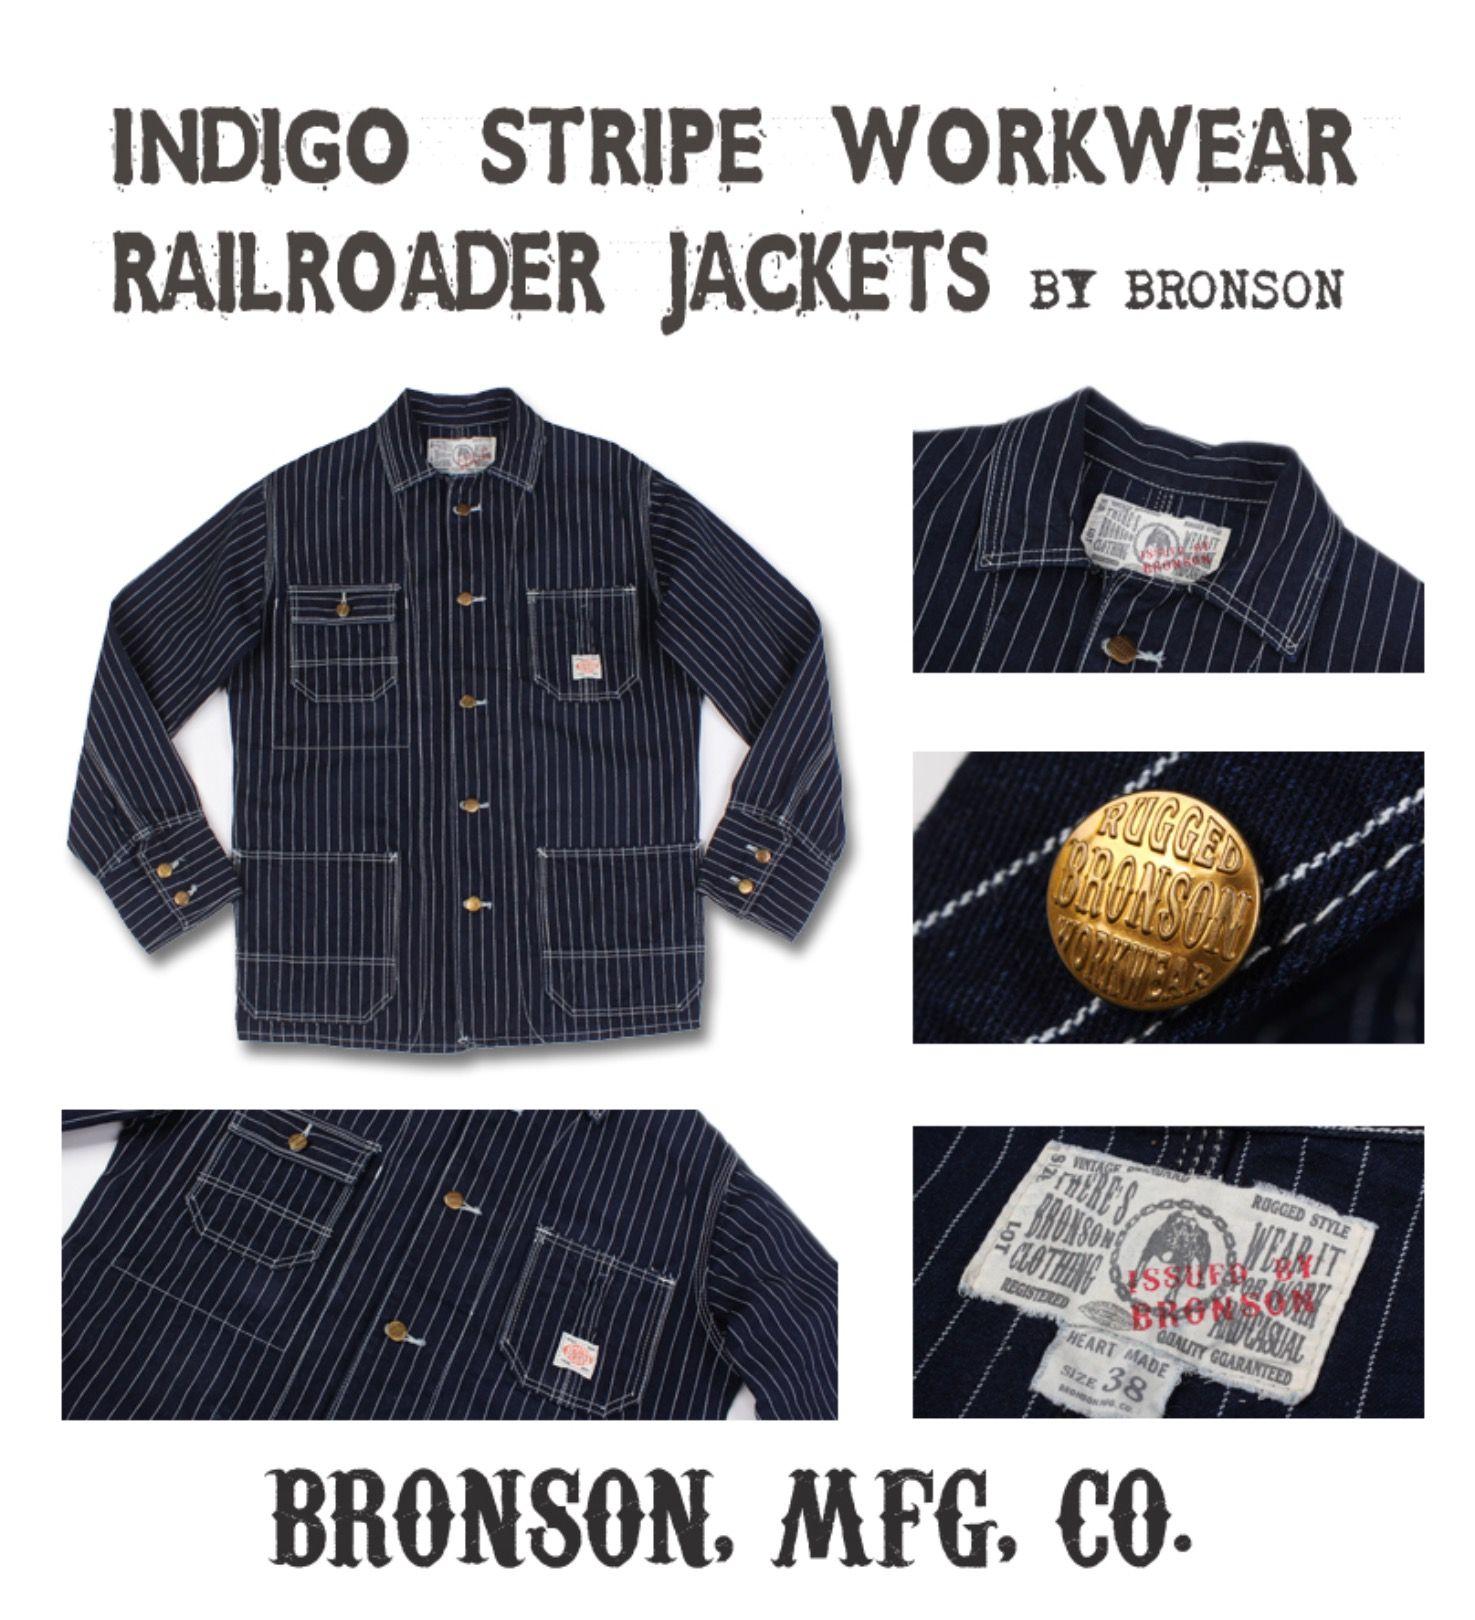 Size L 42R ** Incredible 1930s Railroad Work Chore Denim Jacket